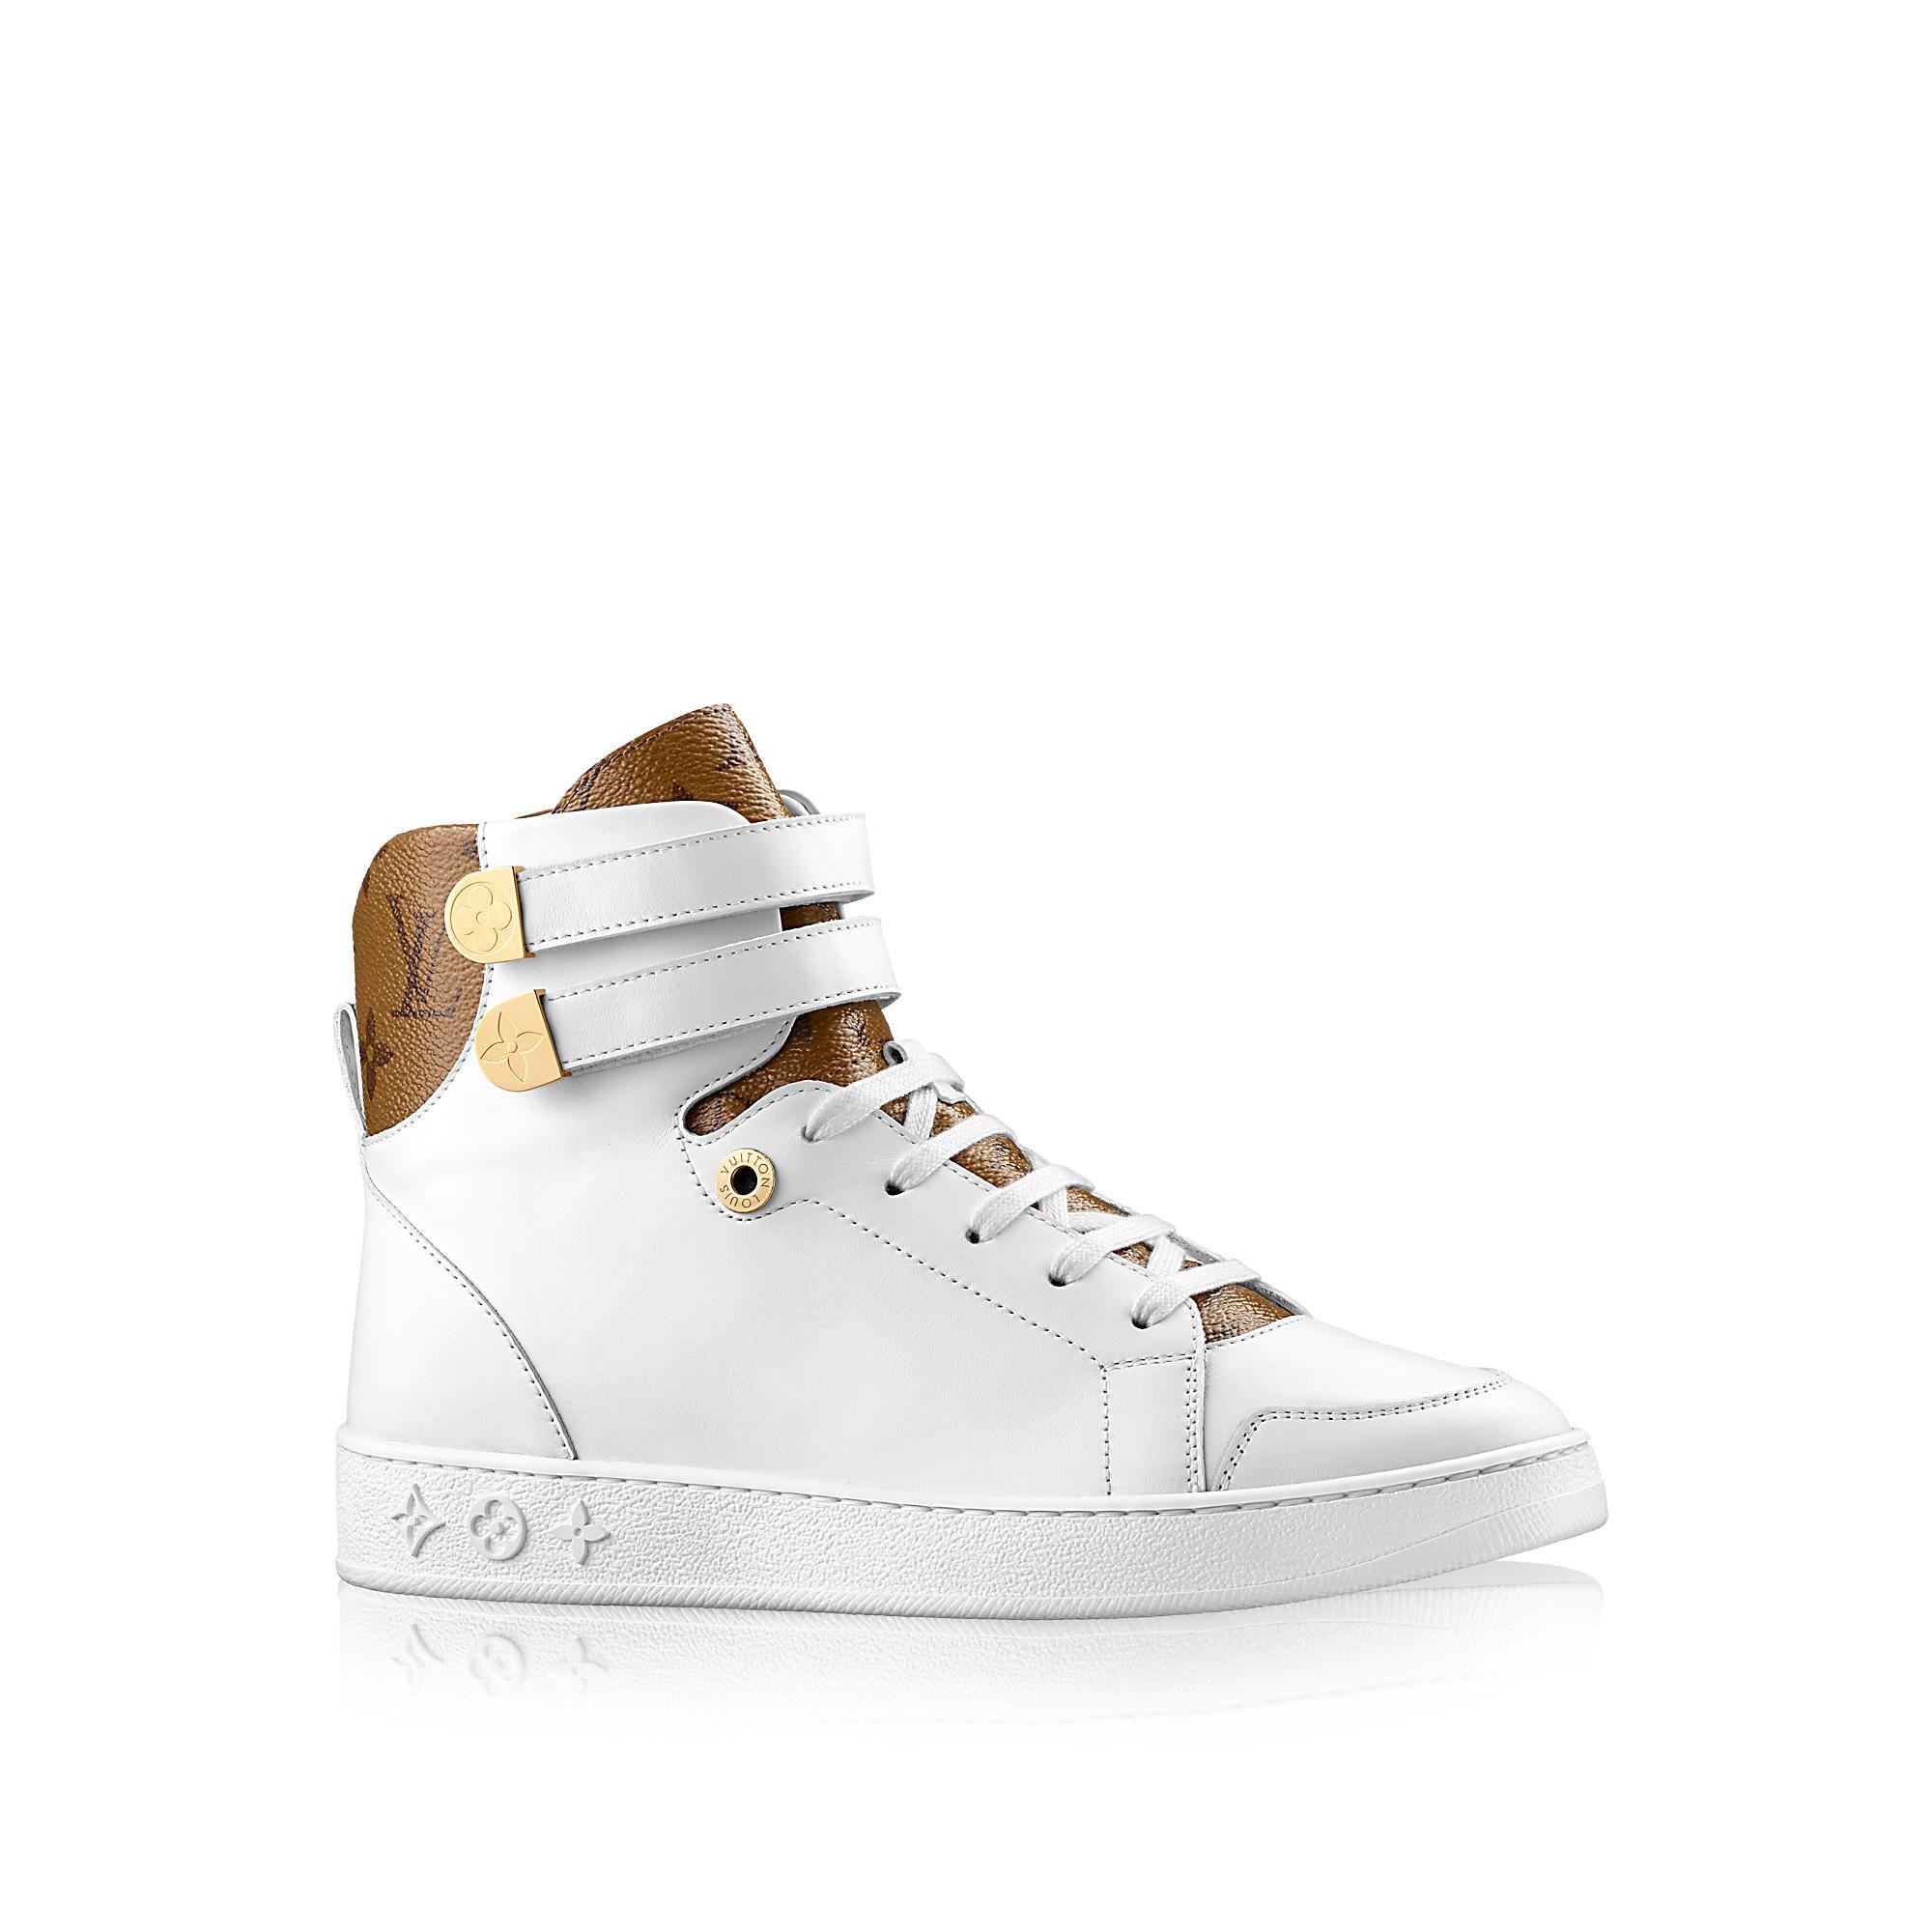 Boombox Sneaker Boot via Louis Vuitton